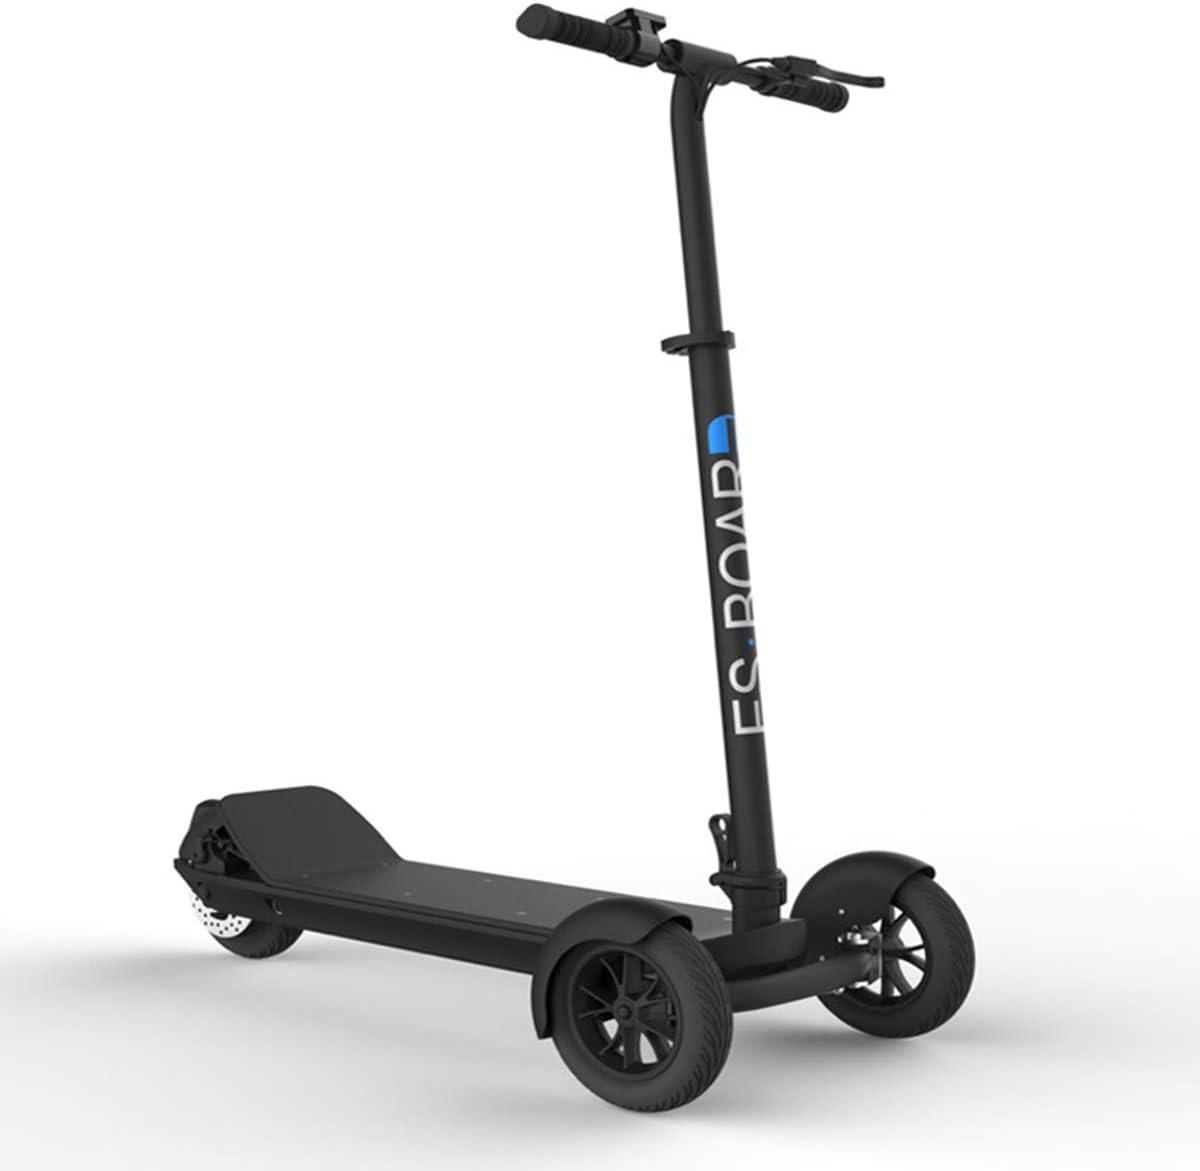 Dapang Scooter para Adultos, 3 Ruedas, Barra en T, manija de Altura Ajustable, patinetas, 500W 48V, Bicicleta eléctrica Impermeable con Rango de 30 Millas, Marco Plegable,2,30km